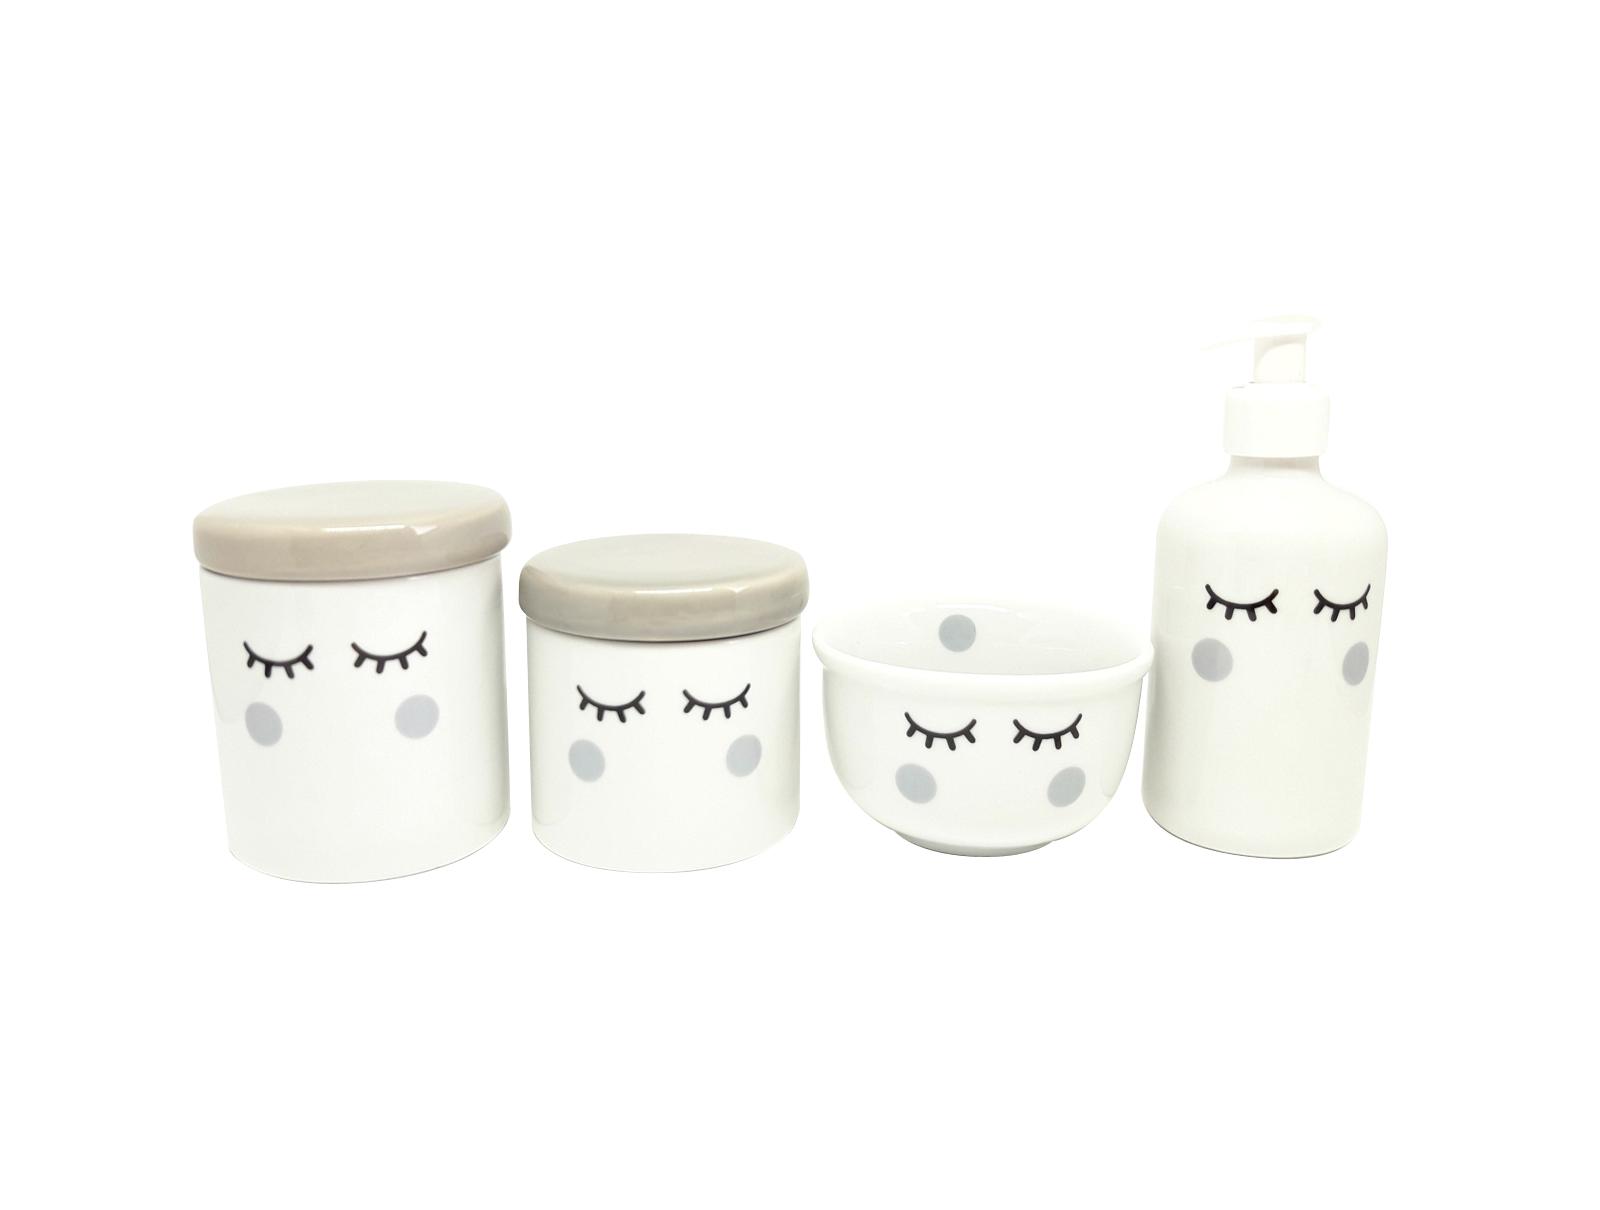 kit Higiene Bebê Porcelana Olhinhos Cílios com Tampa Cinza 4 peças